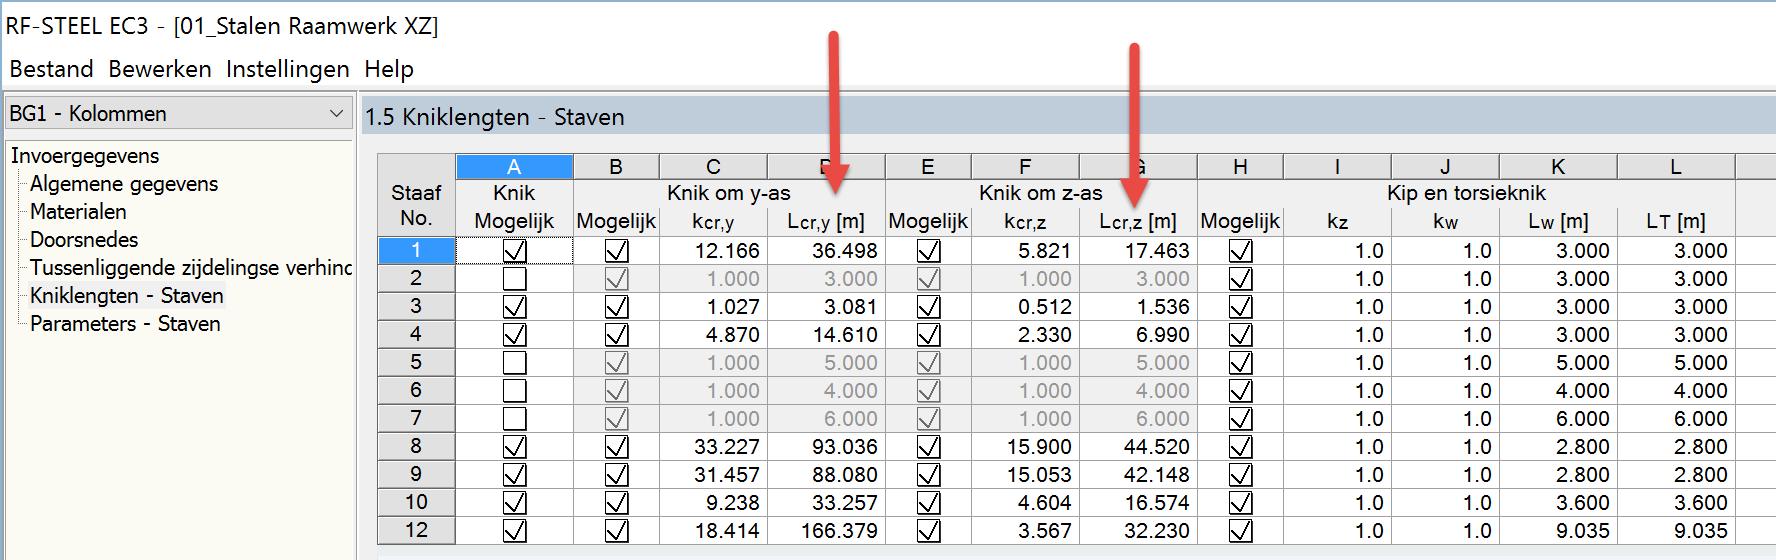 Kniklengtes importeren in RF-STEEL EC3